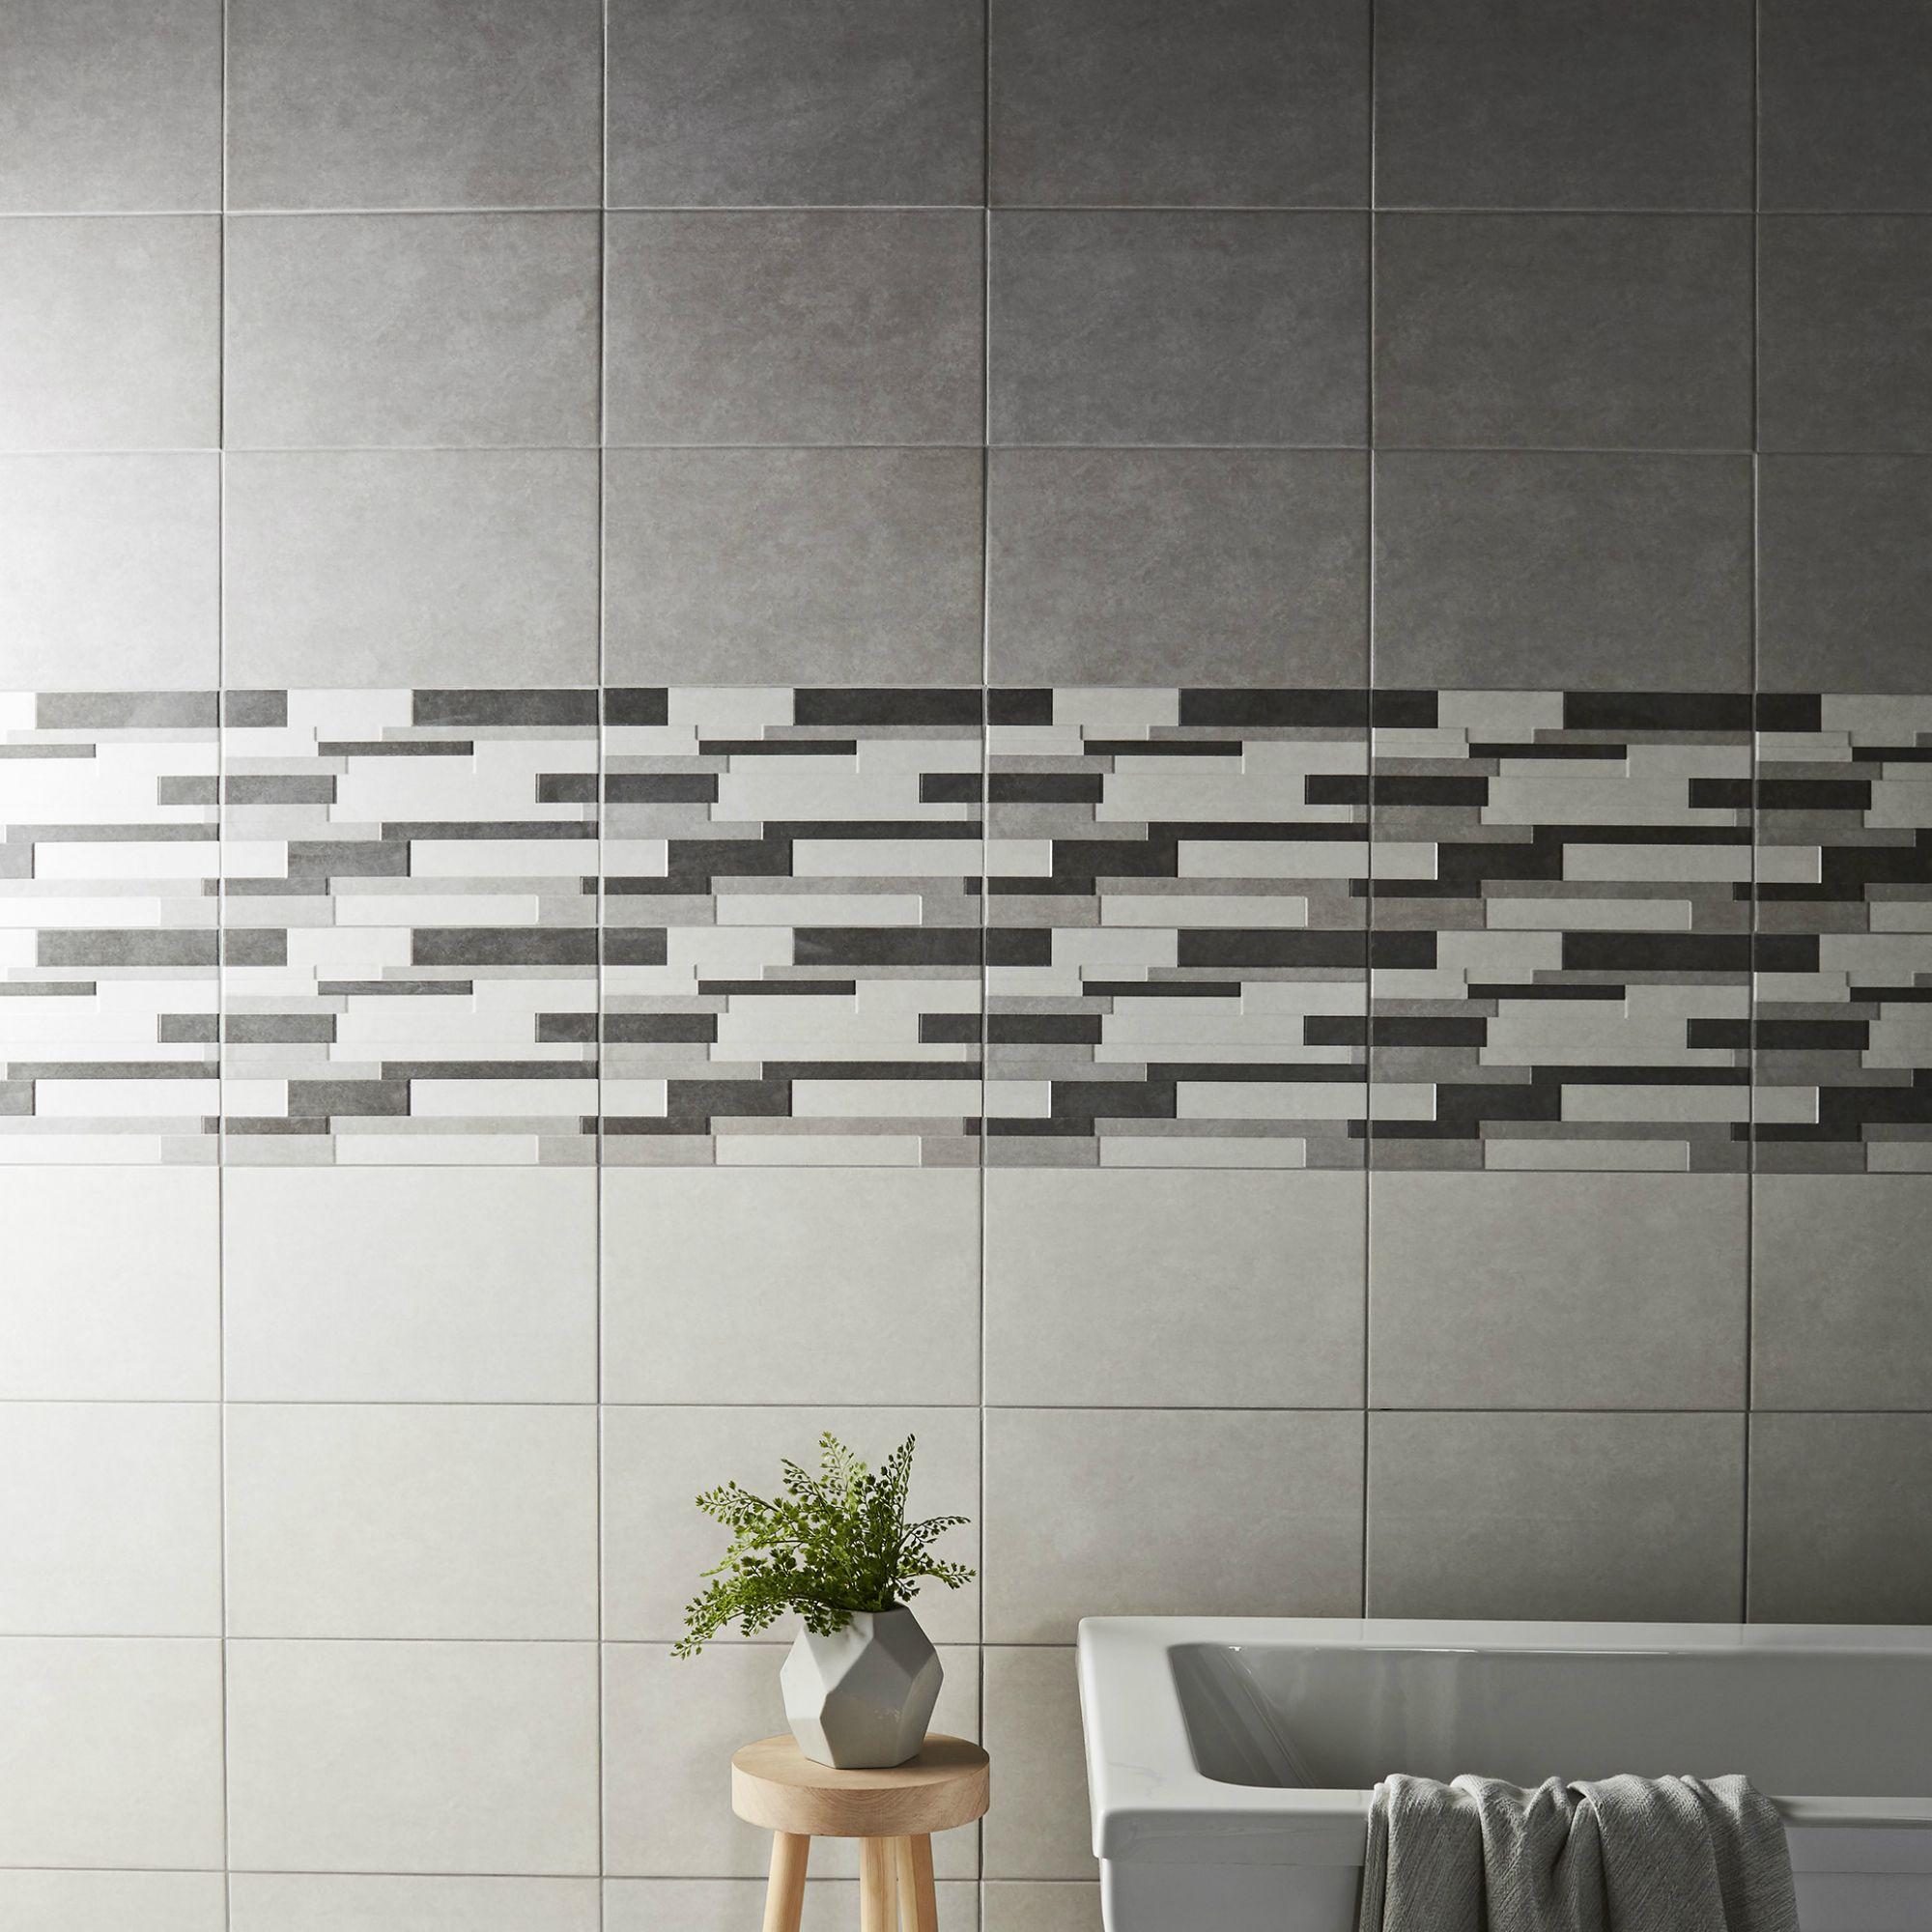 Black Kitchen Tiles B Q: DIY At B&Q